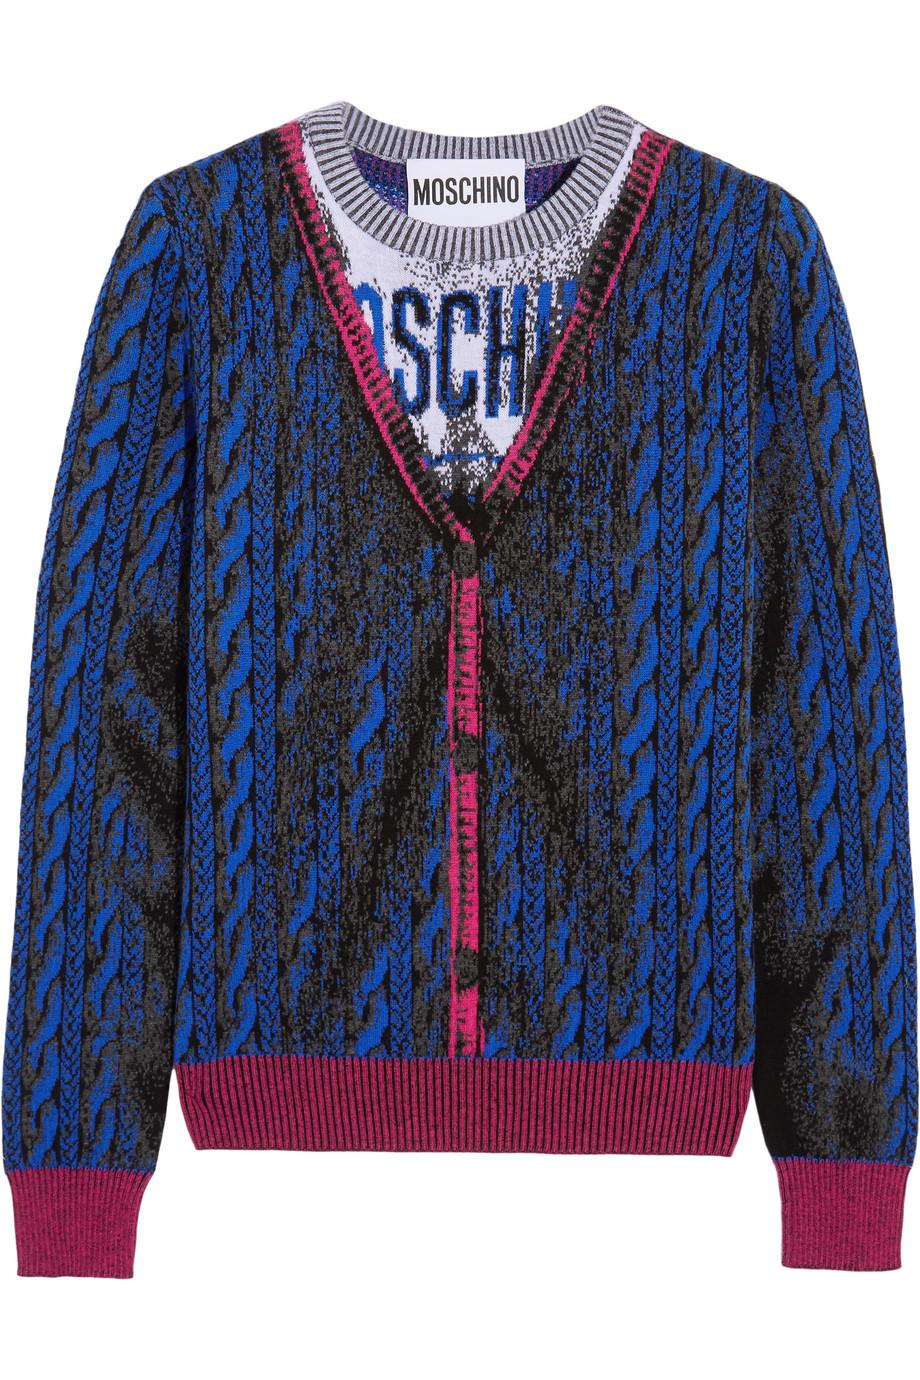 Moschino Intarsia Wool Sweater, Blue, Women's, Size: 40